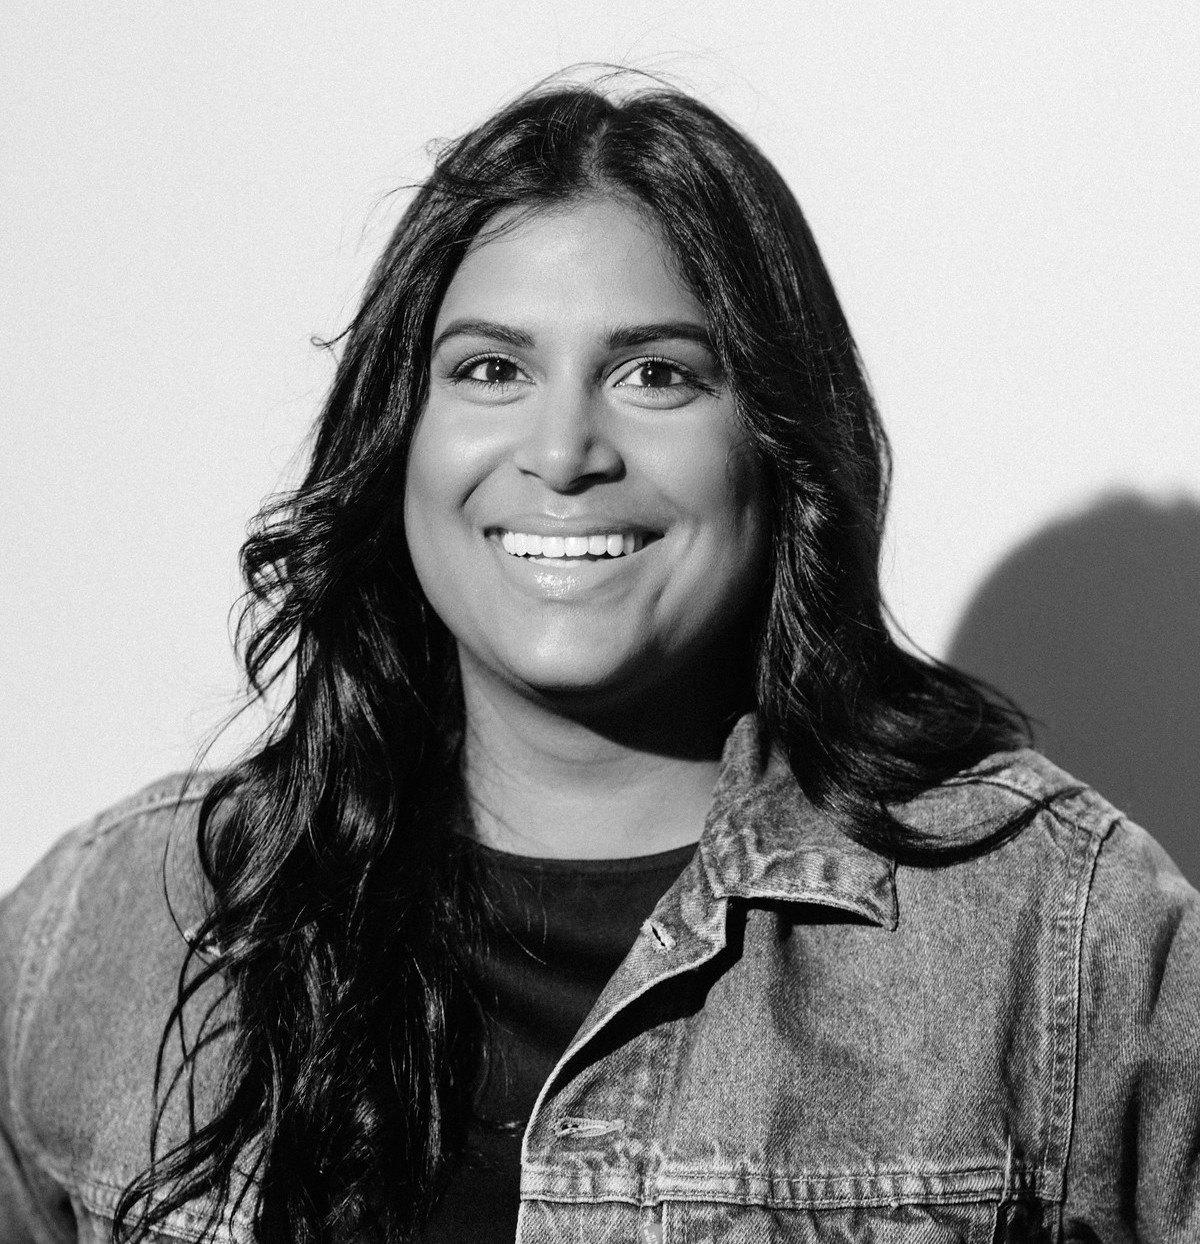 Varuni Palacios headshot